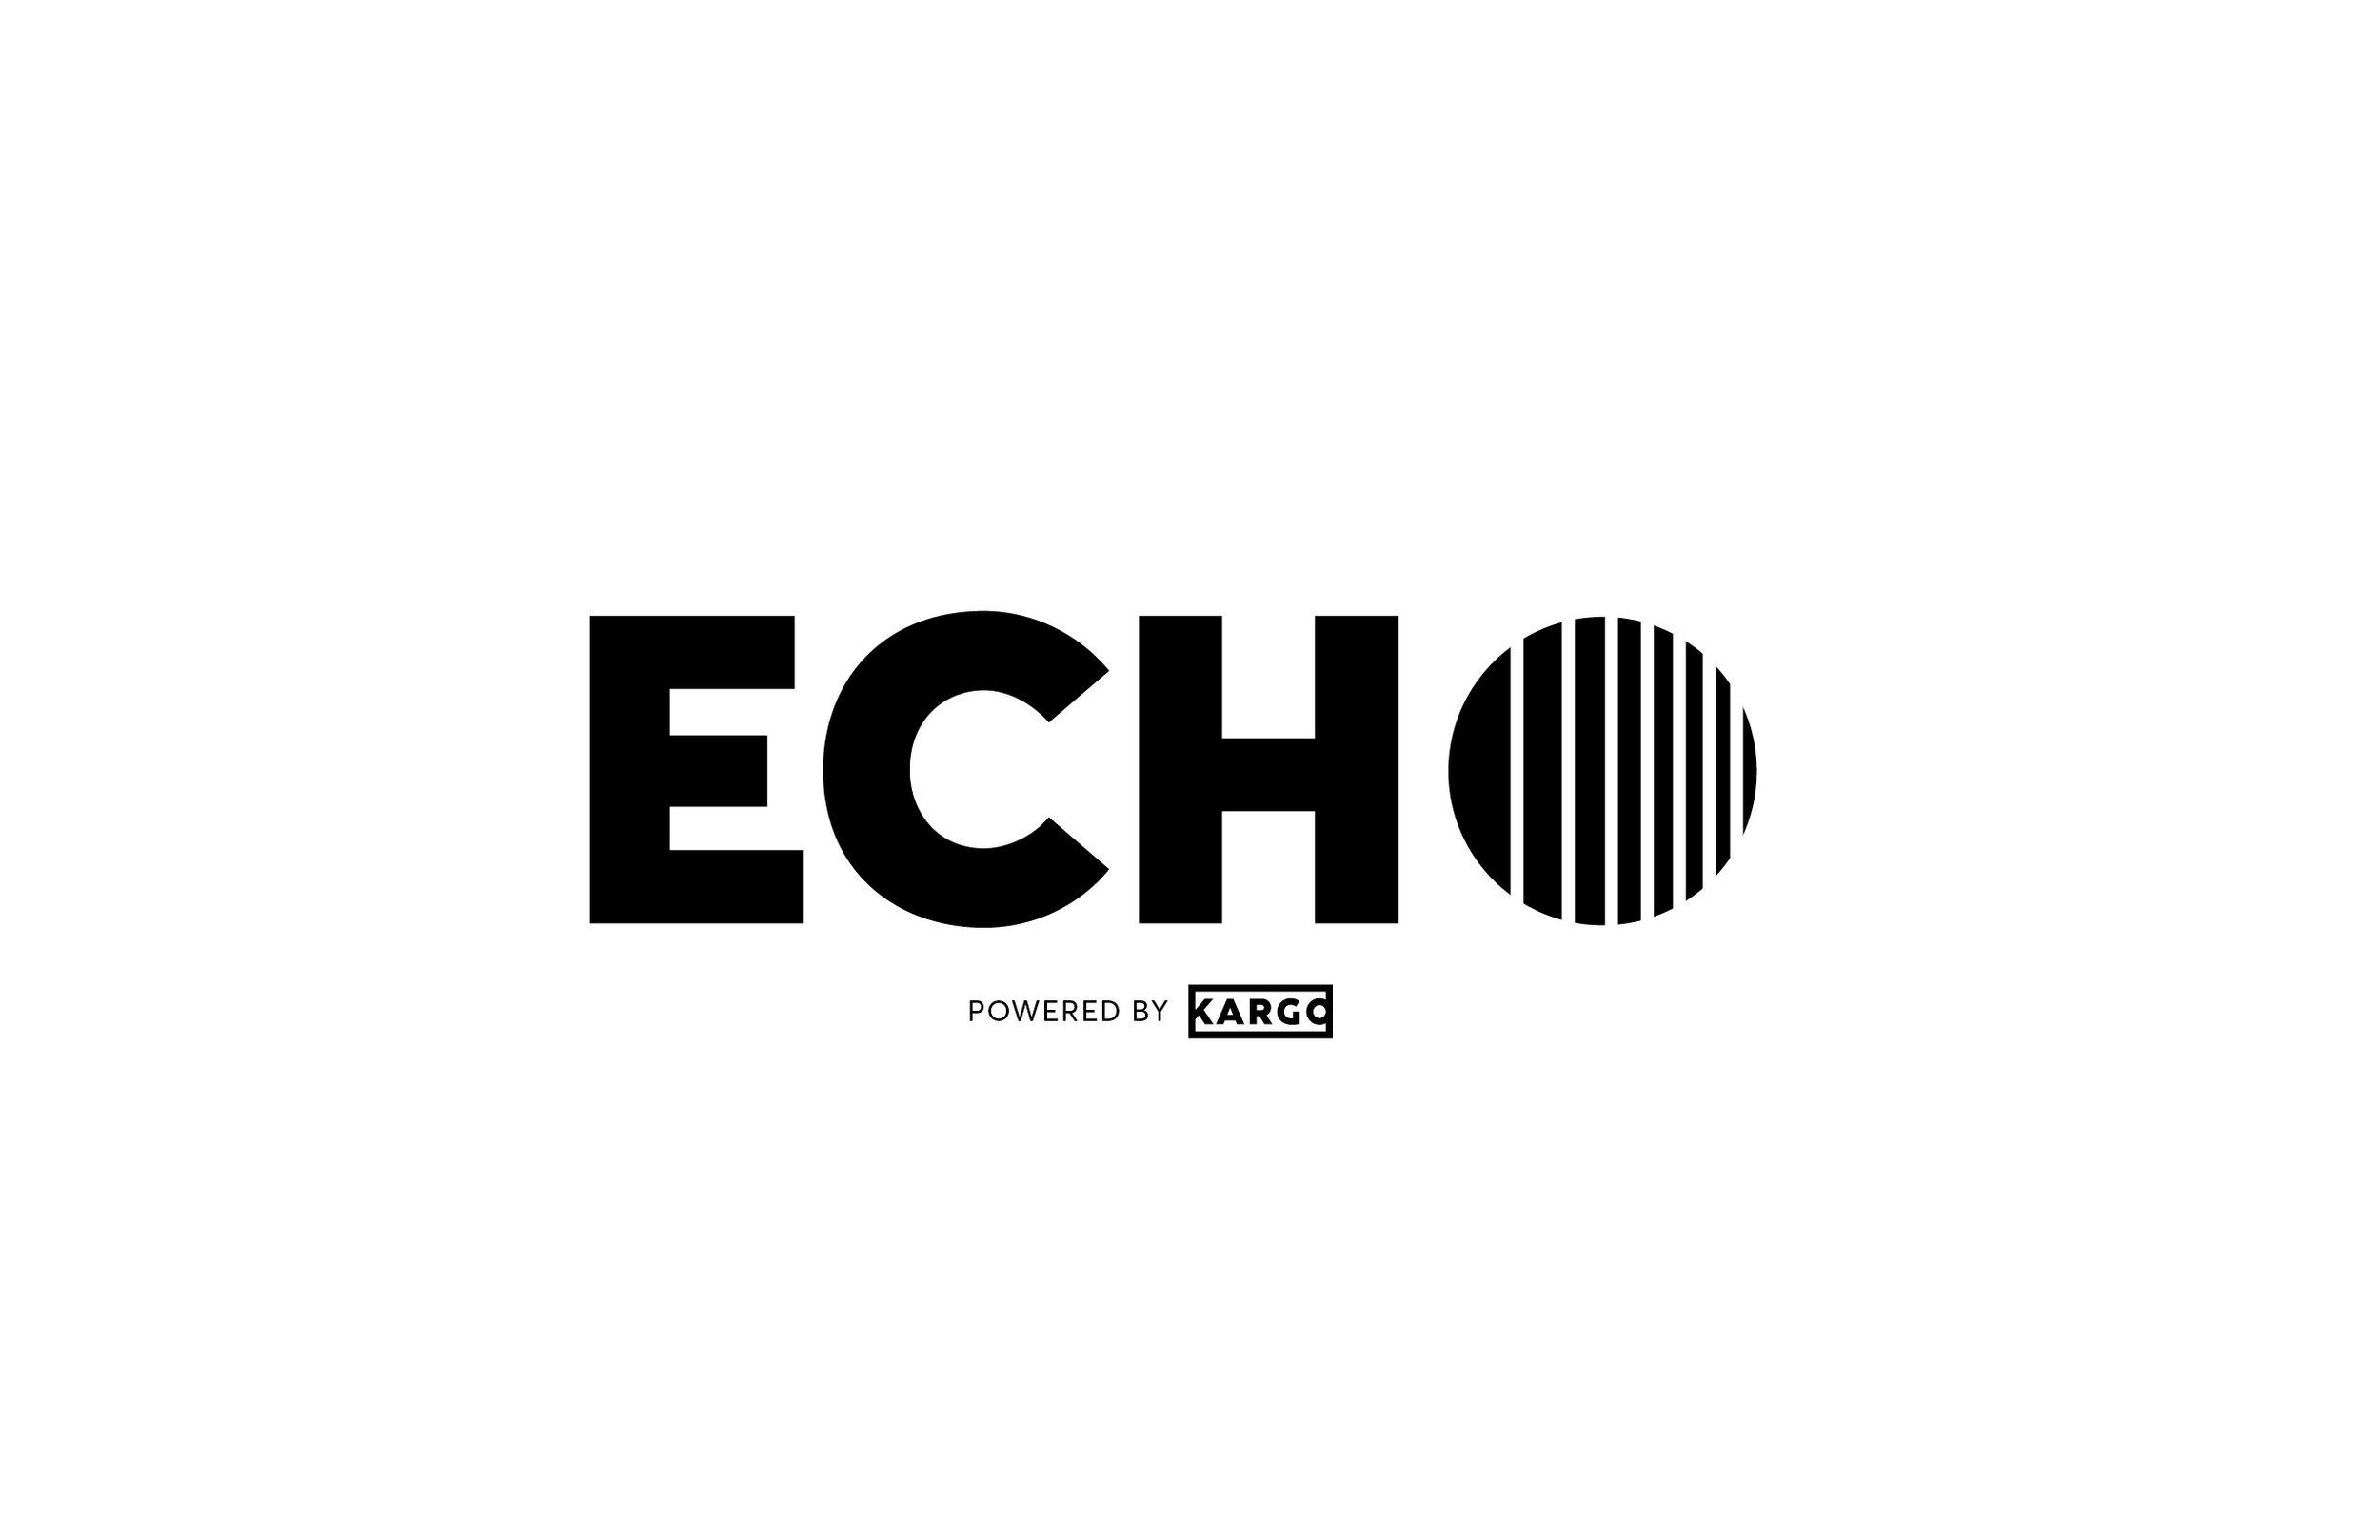 echo logos3.jpg